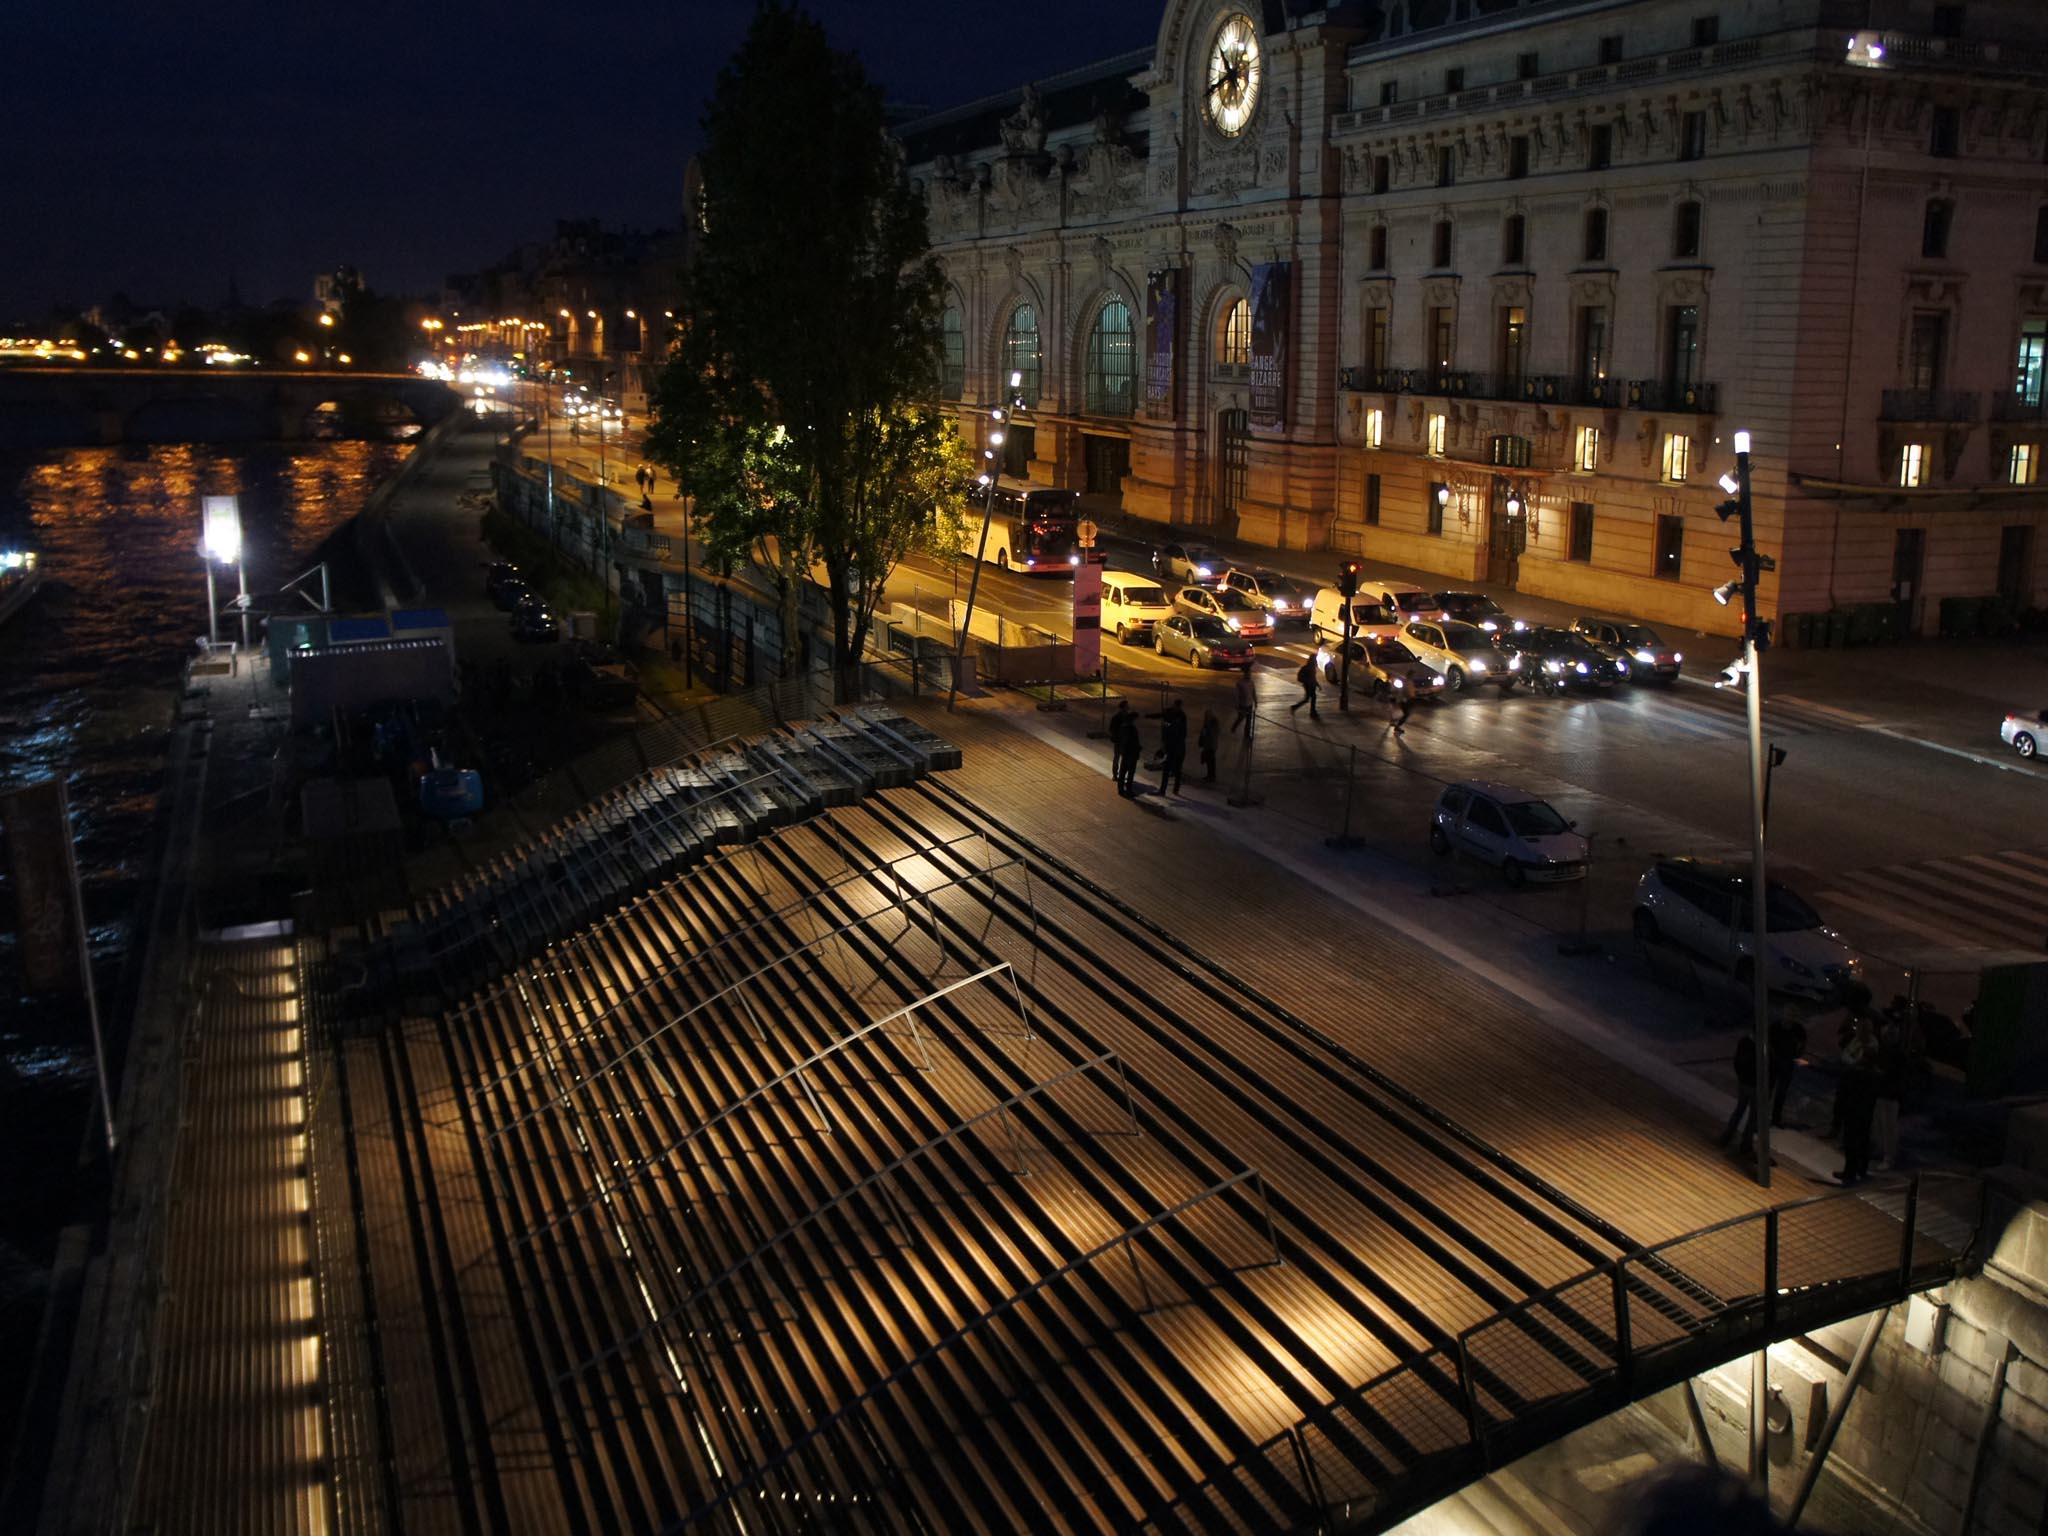 Les emmarchements quai solf rino paris for Architecte montargis